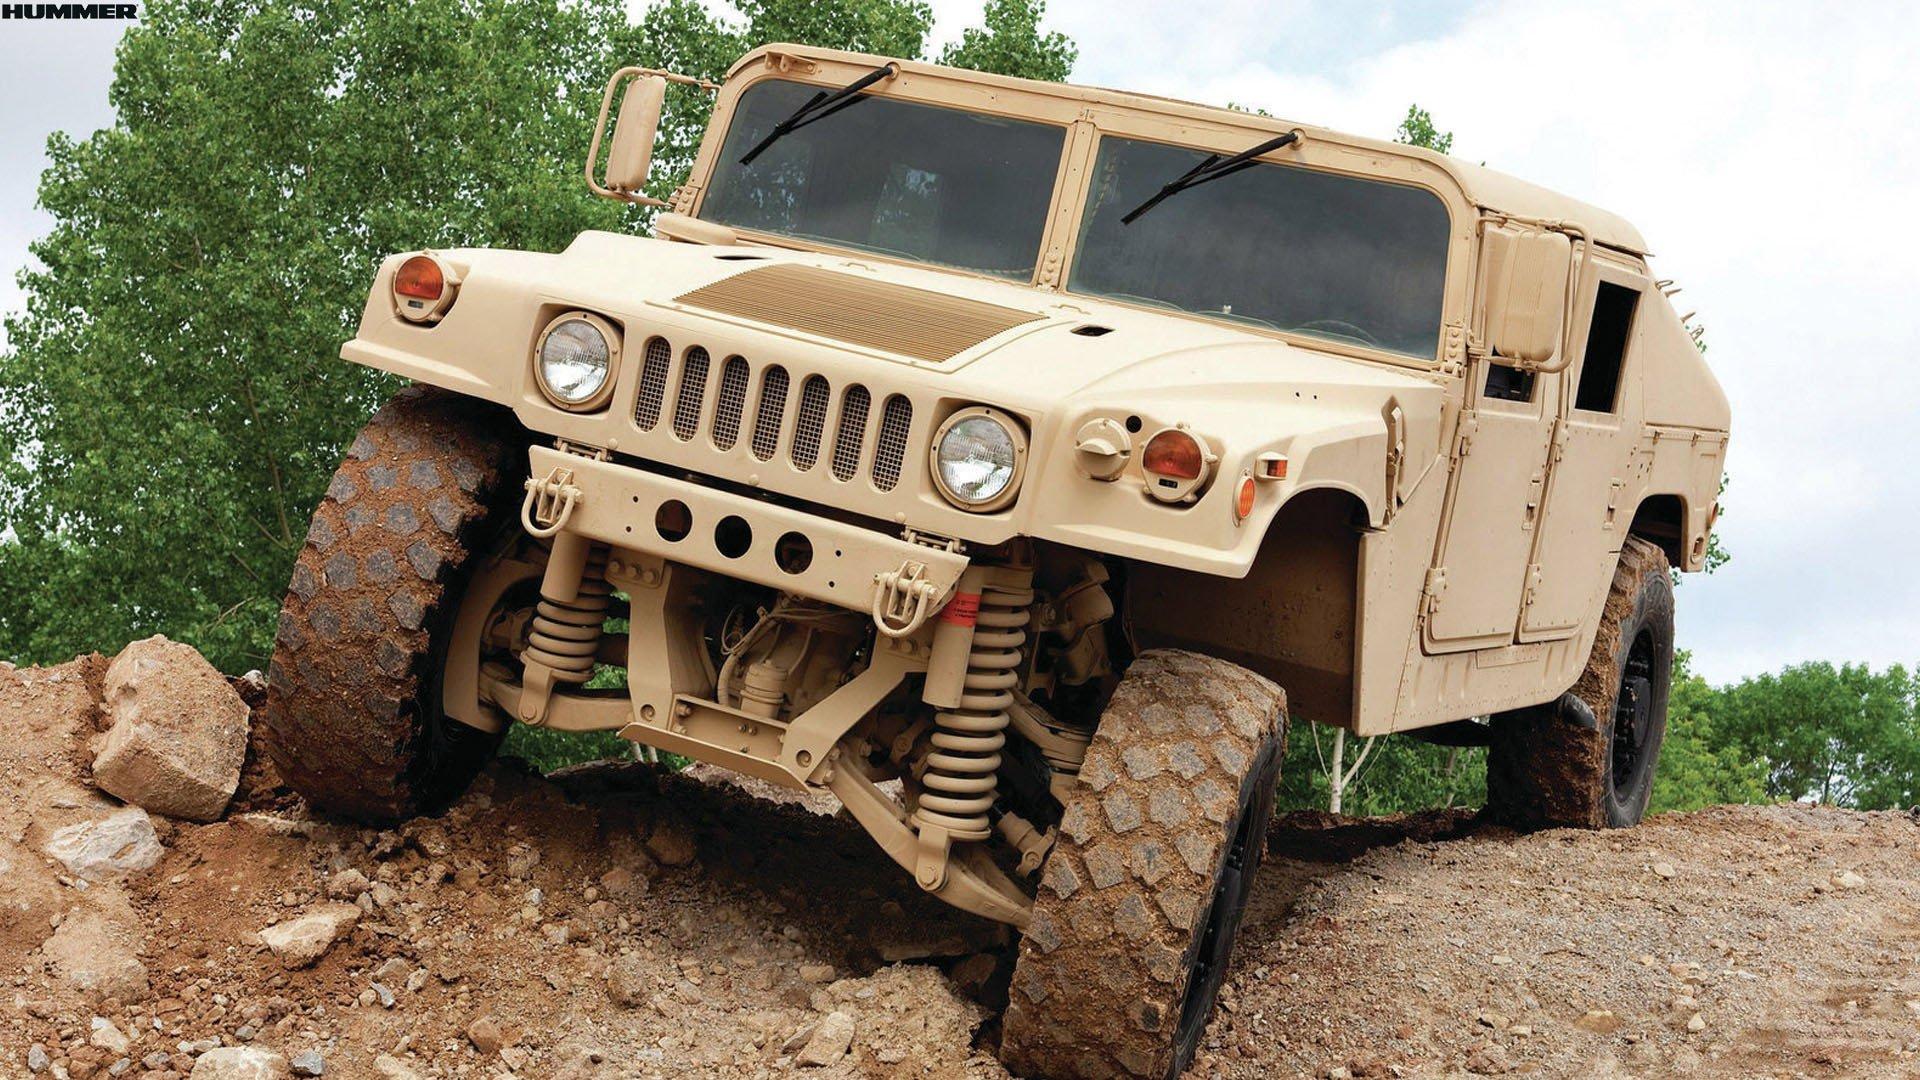 Desert Camo Military Hummer H1 Wallpaper Wallpaper